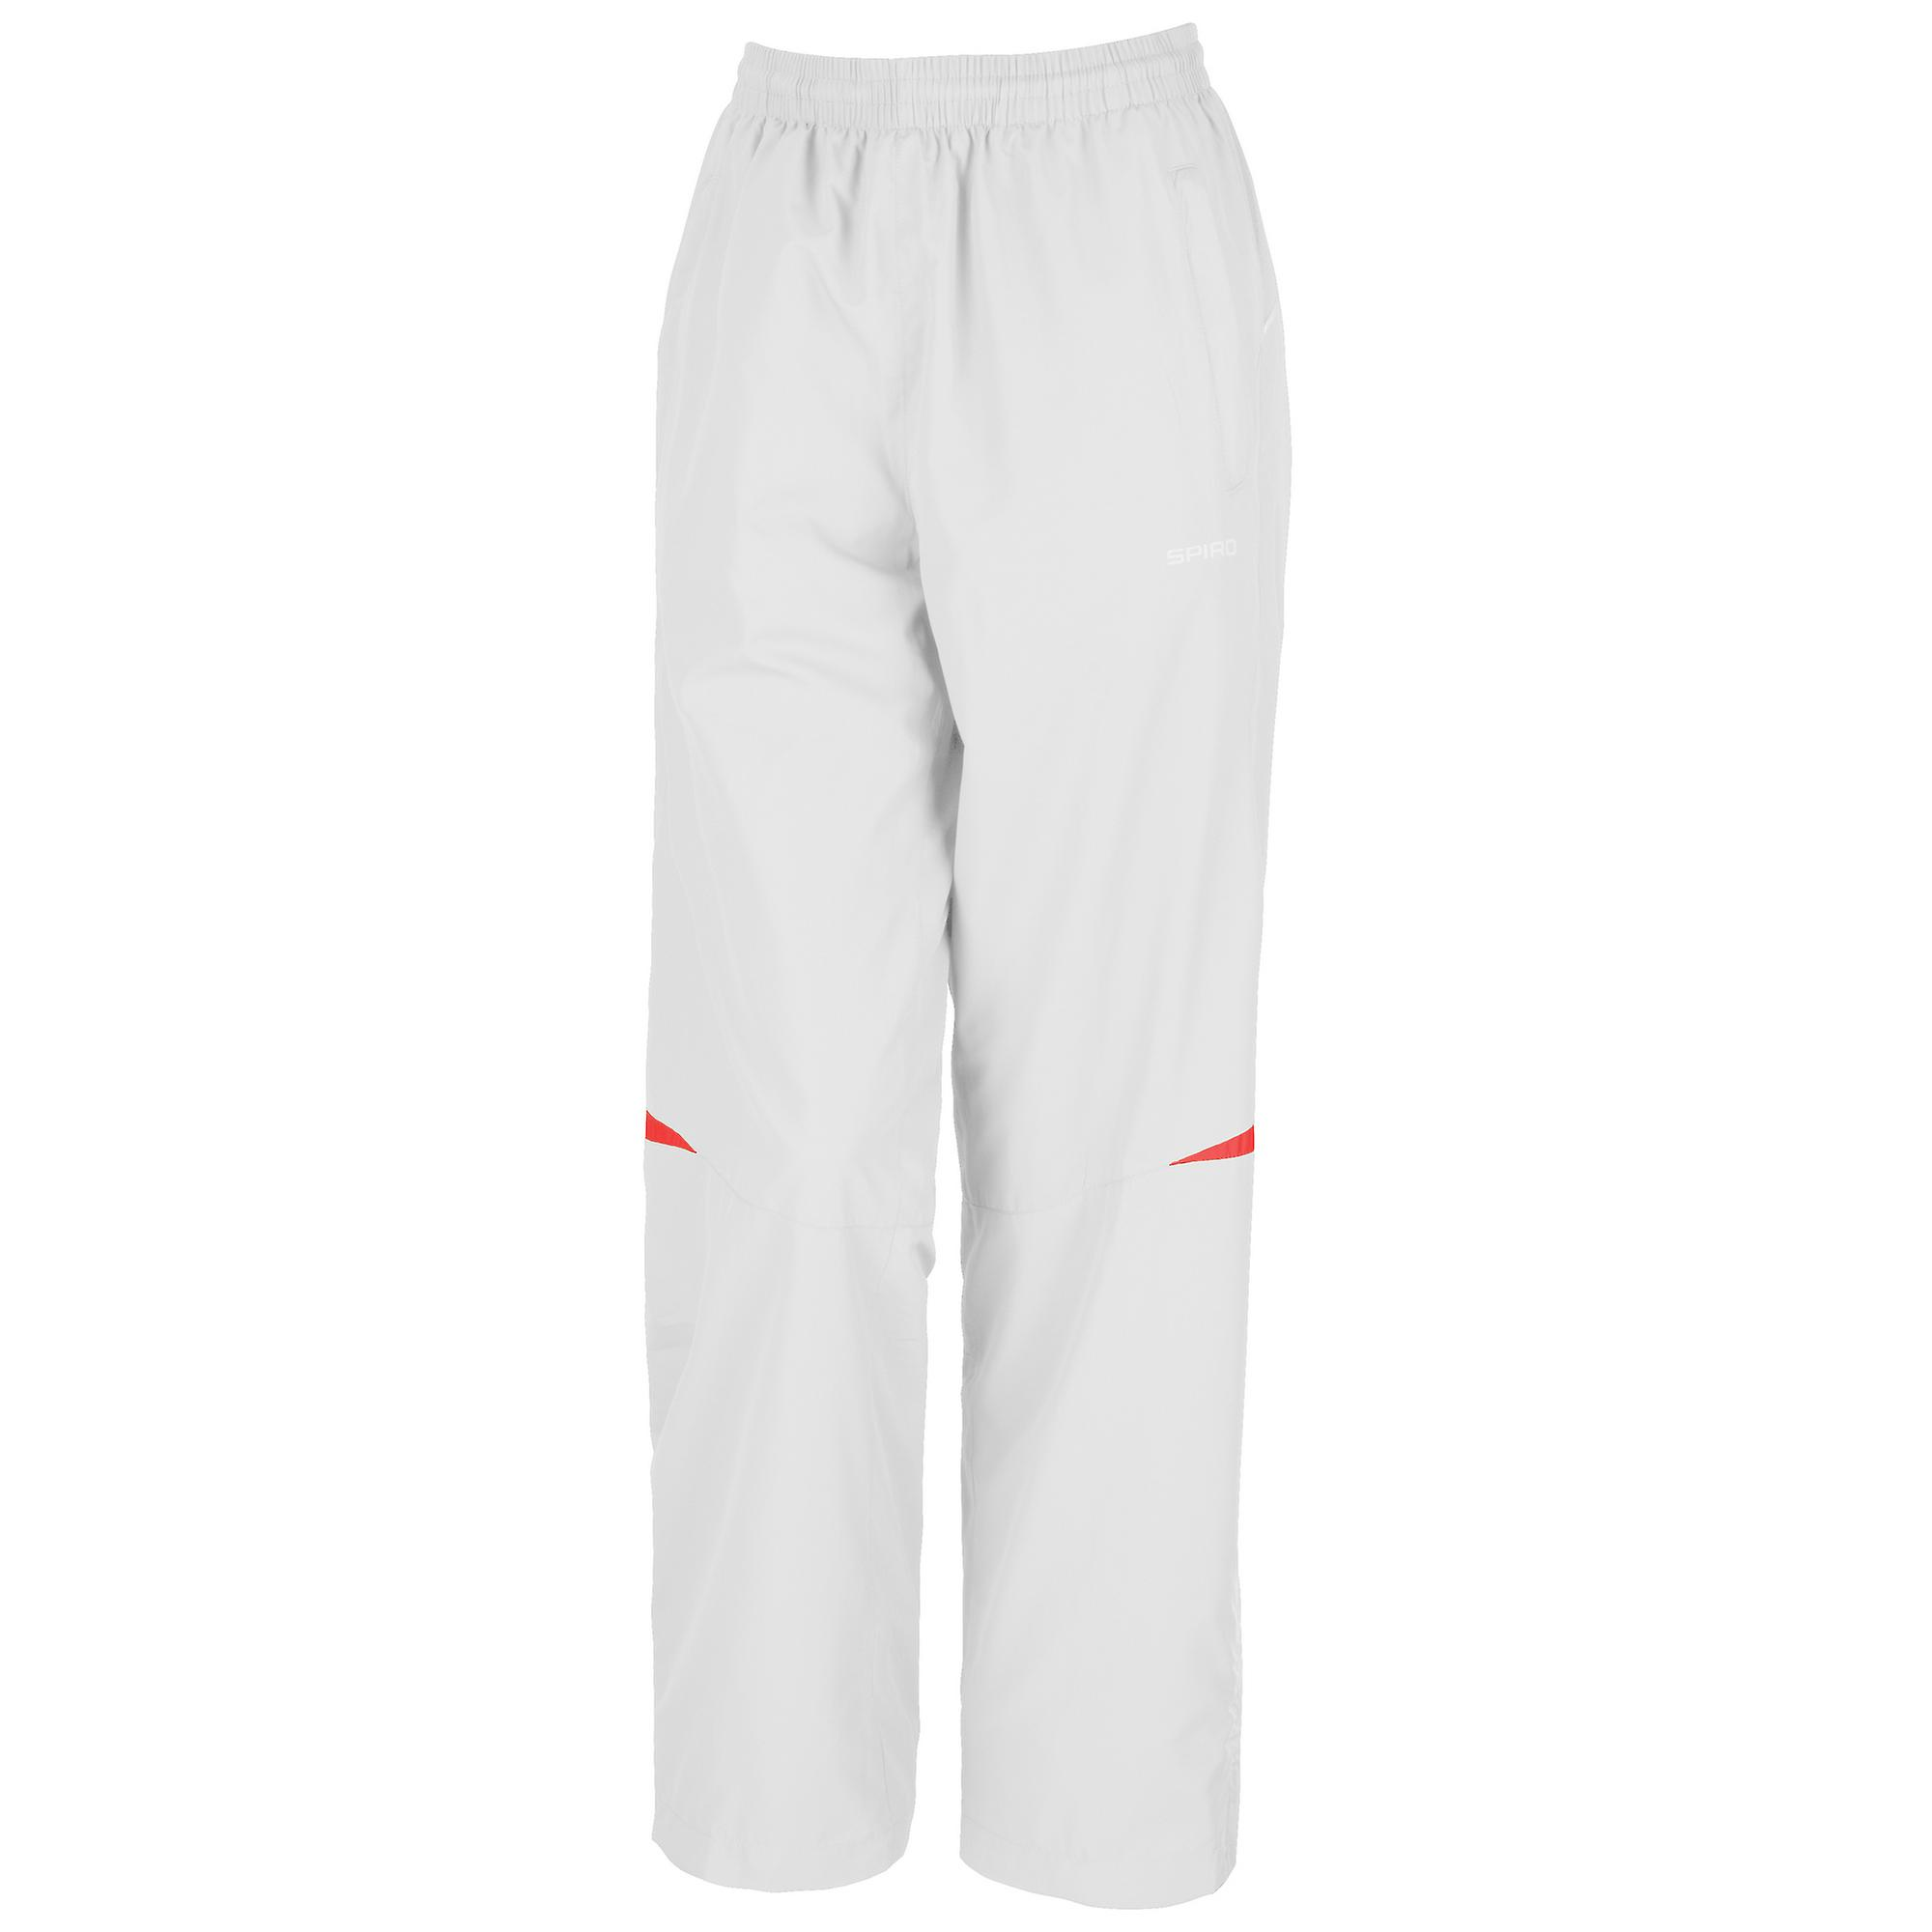 Spiro Womens//Ladies Micro-Lite Performance Sports Pants Black//Red Tracksuit Bottoms XS